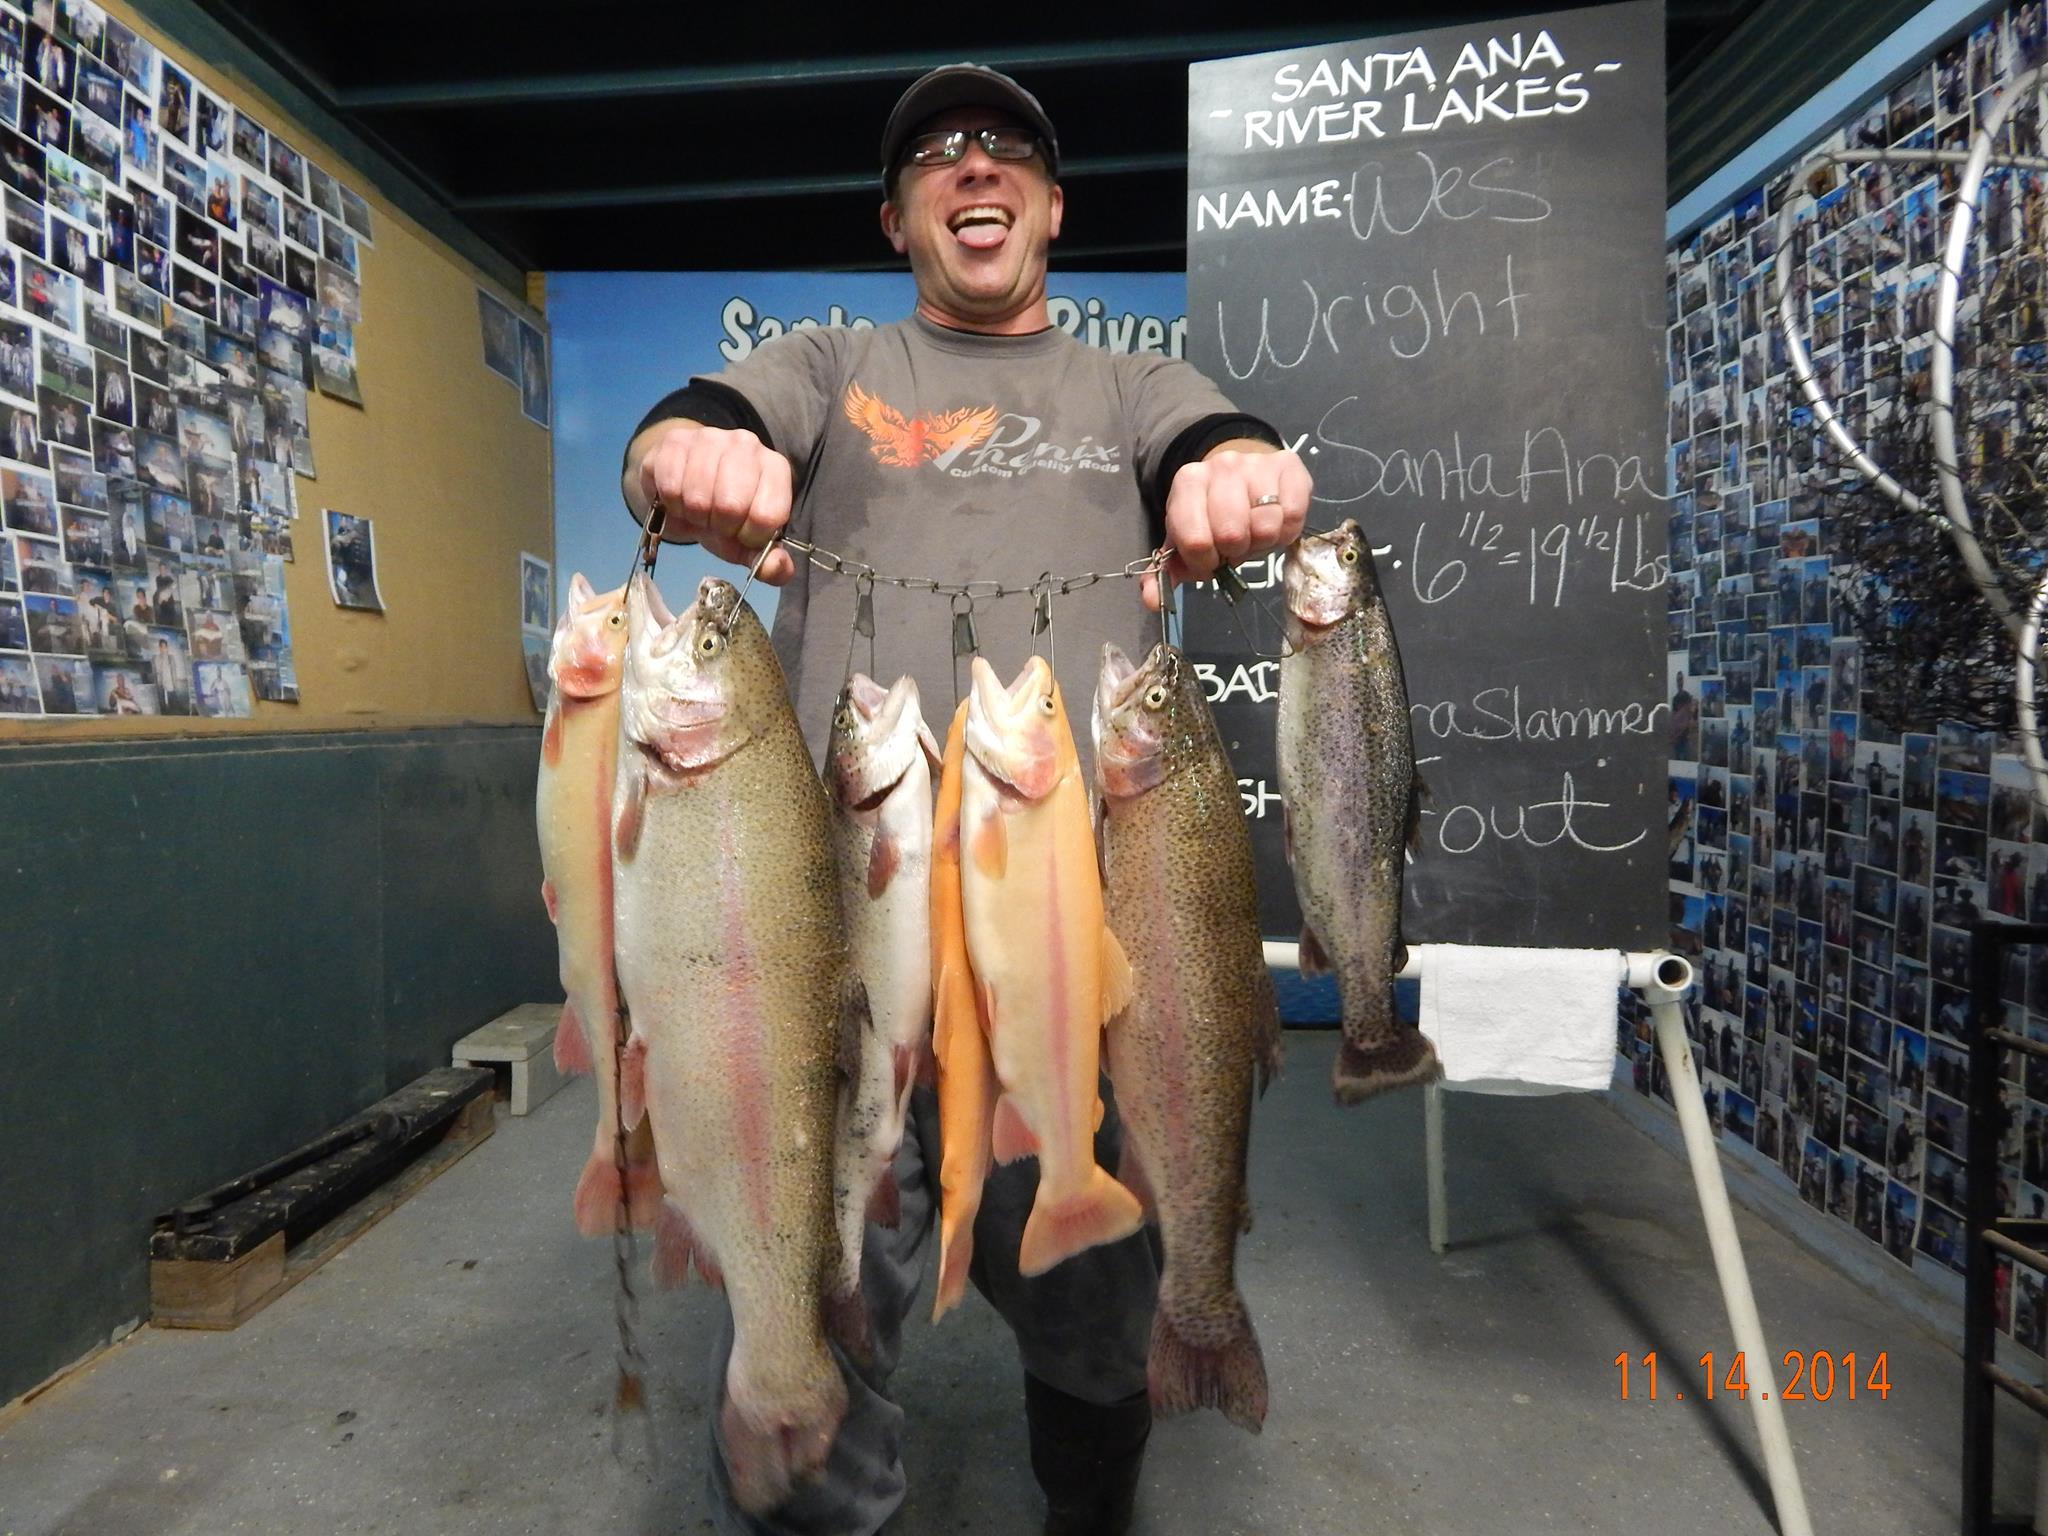 Current fish report 11 18 14 for Santa ana river lakes fishing